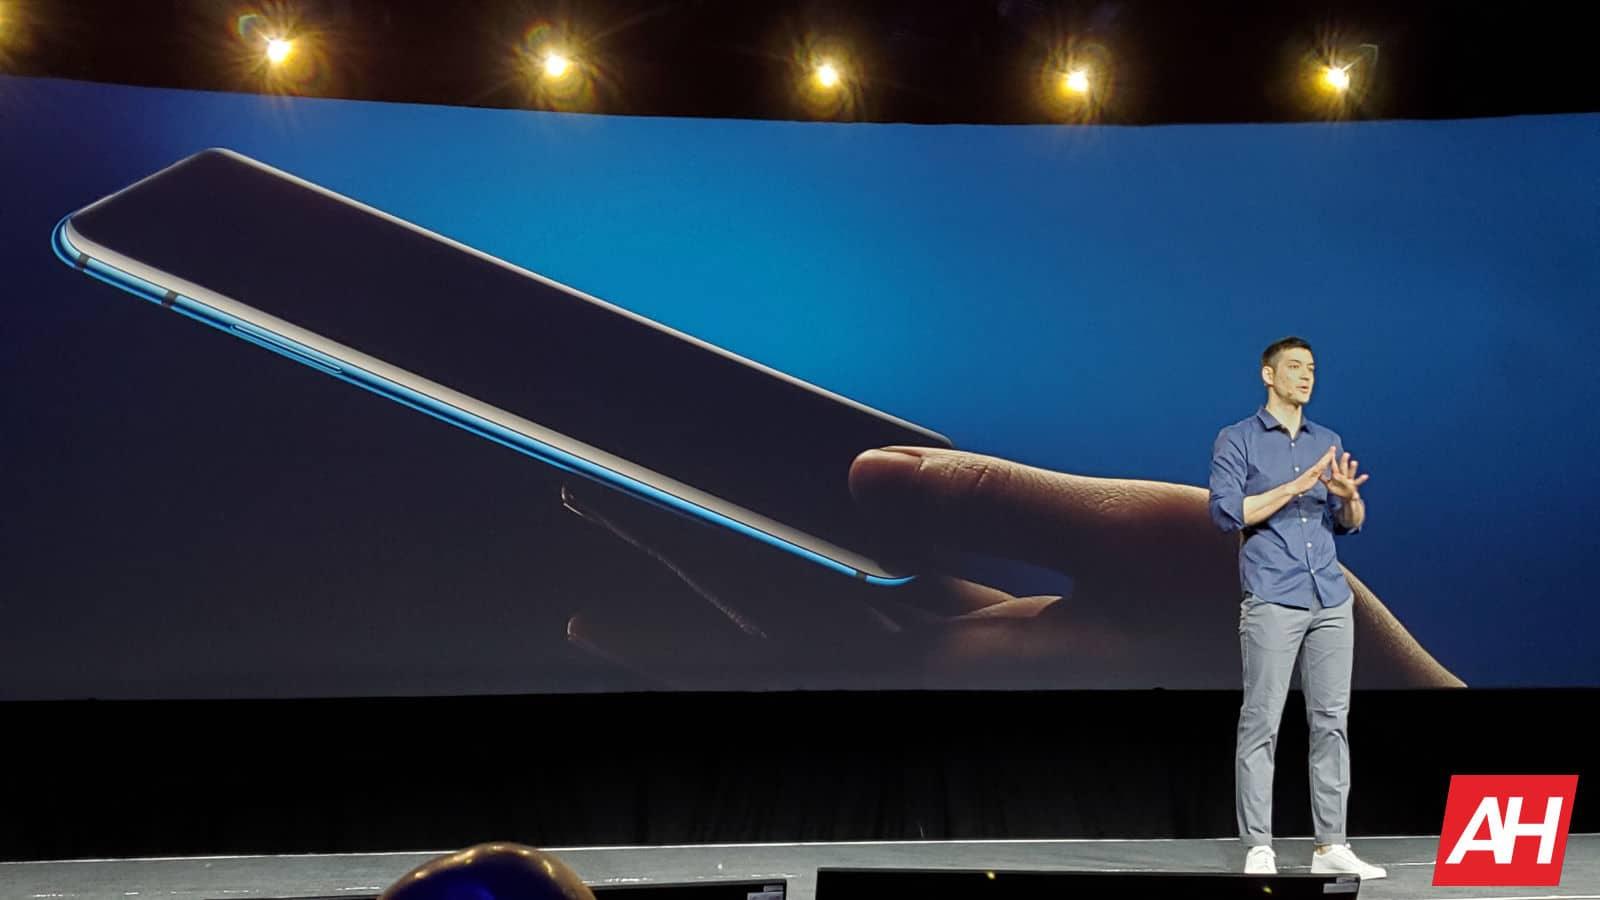 OnePlus 7 Pro Launch AH 7